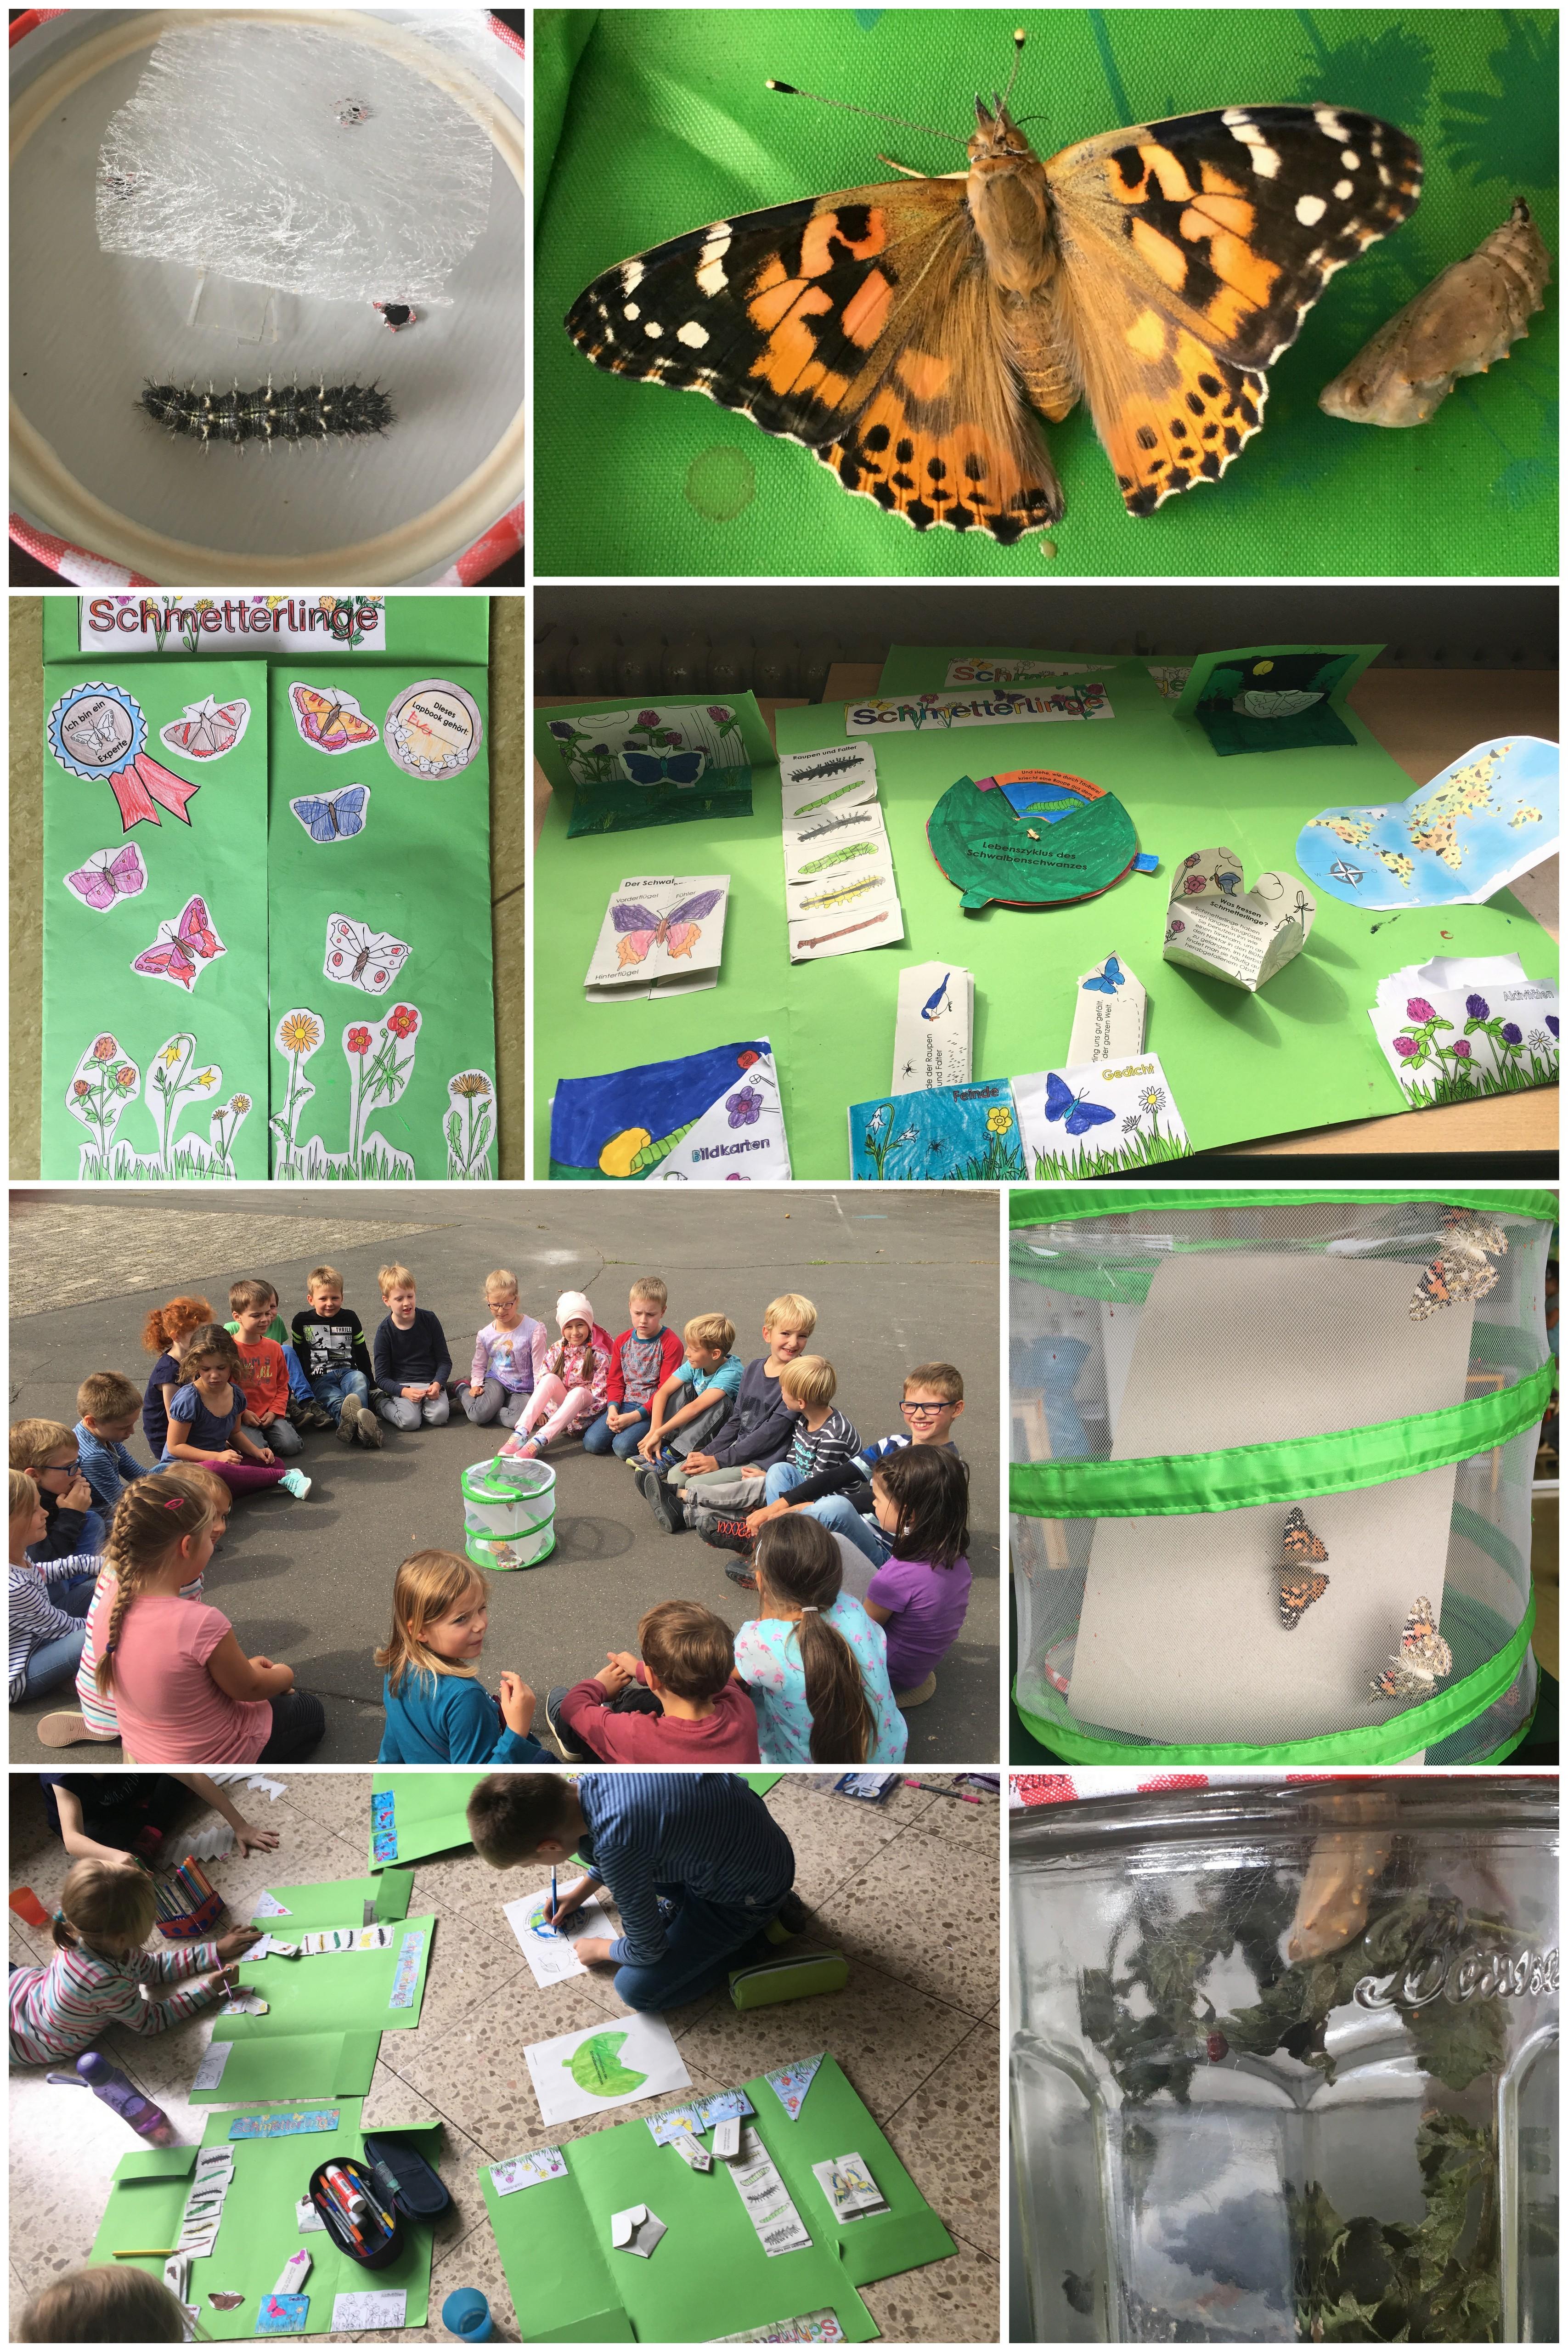 Grundschule Hillesheim Blog Archive Schmetterlinge In